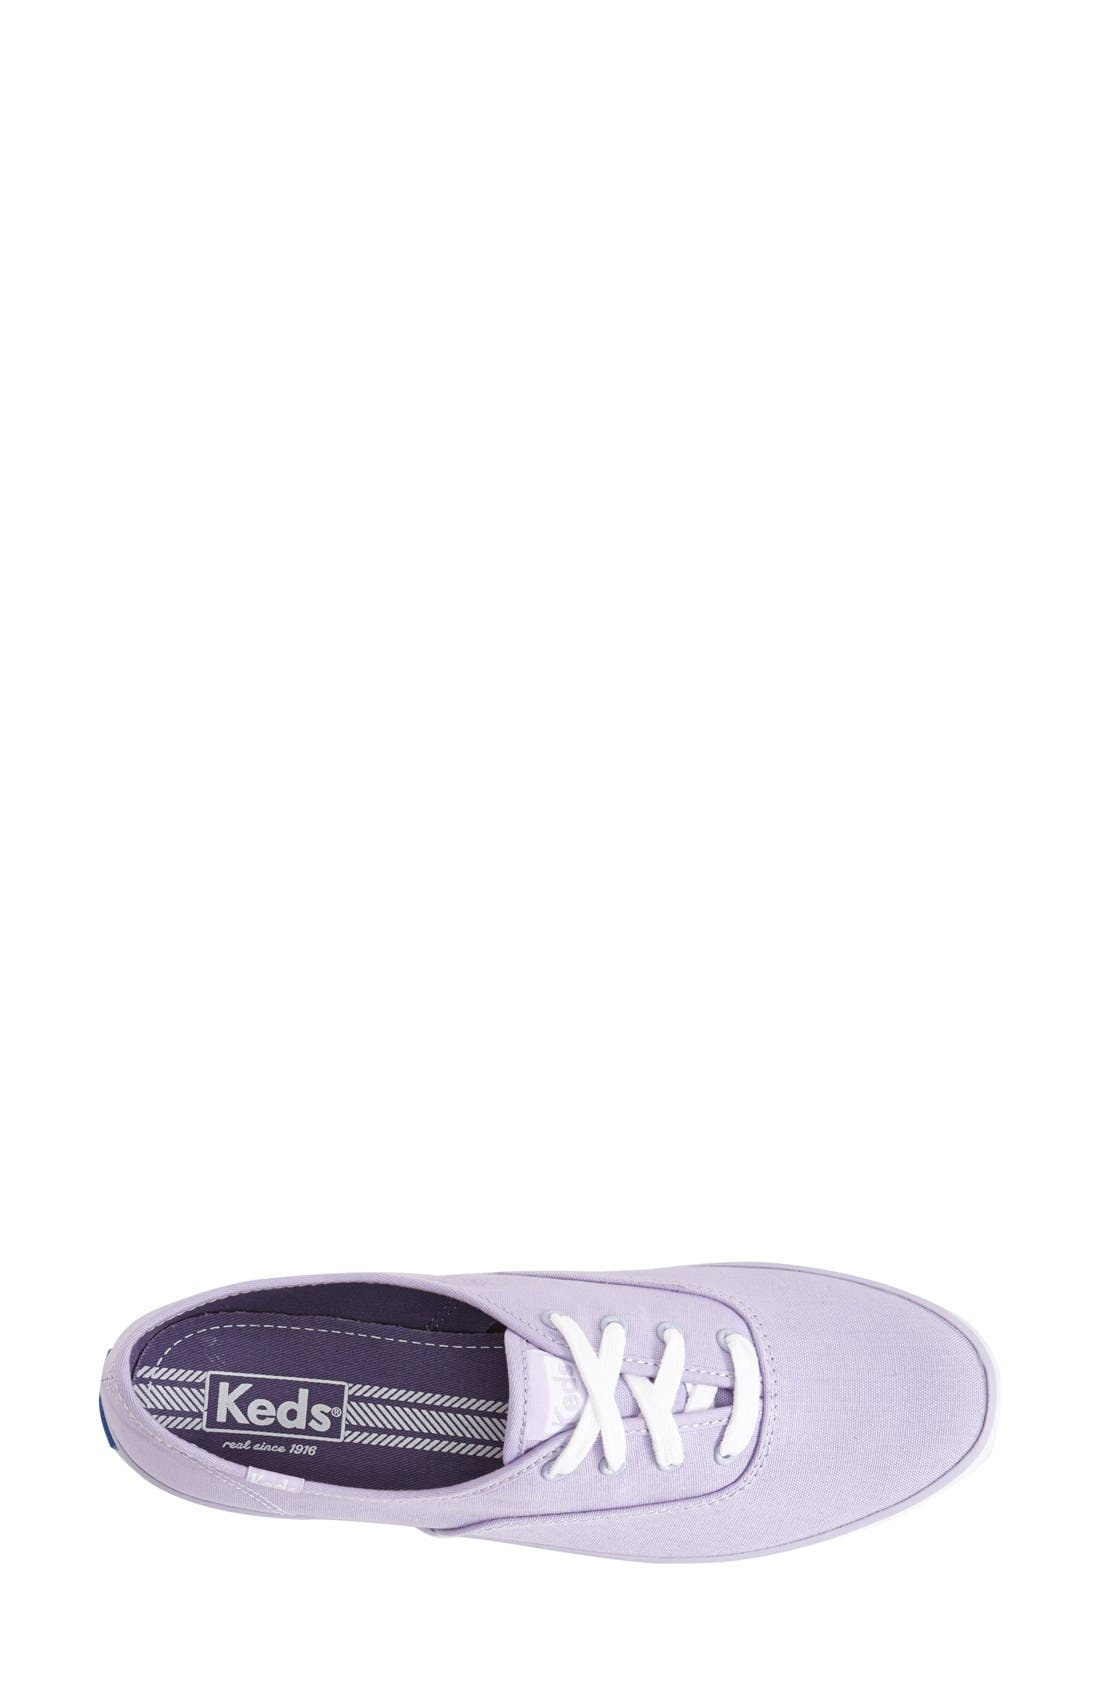 Alternate Image 3  - Keds® 'Champion - Seasonal' Sneaker (Women)